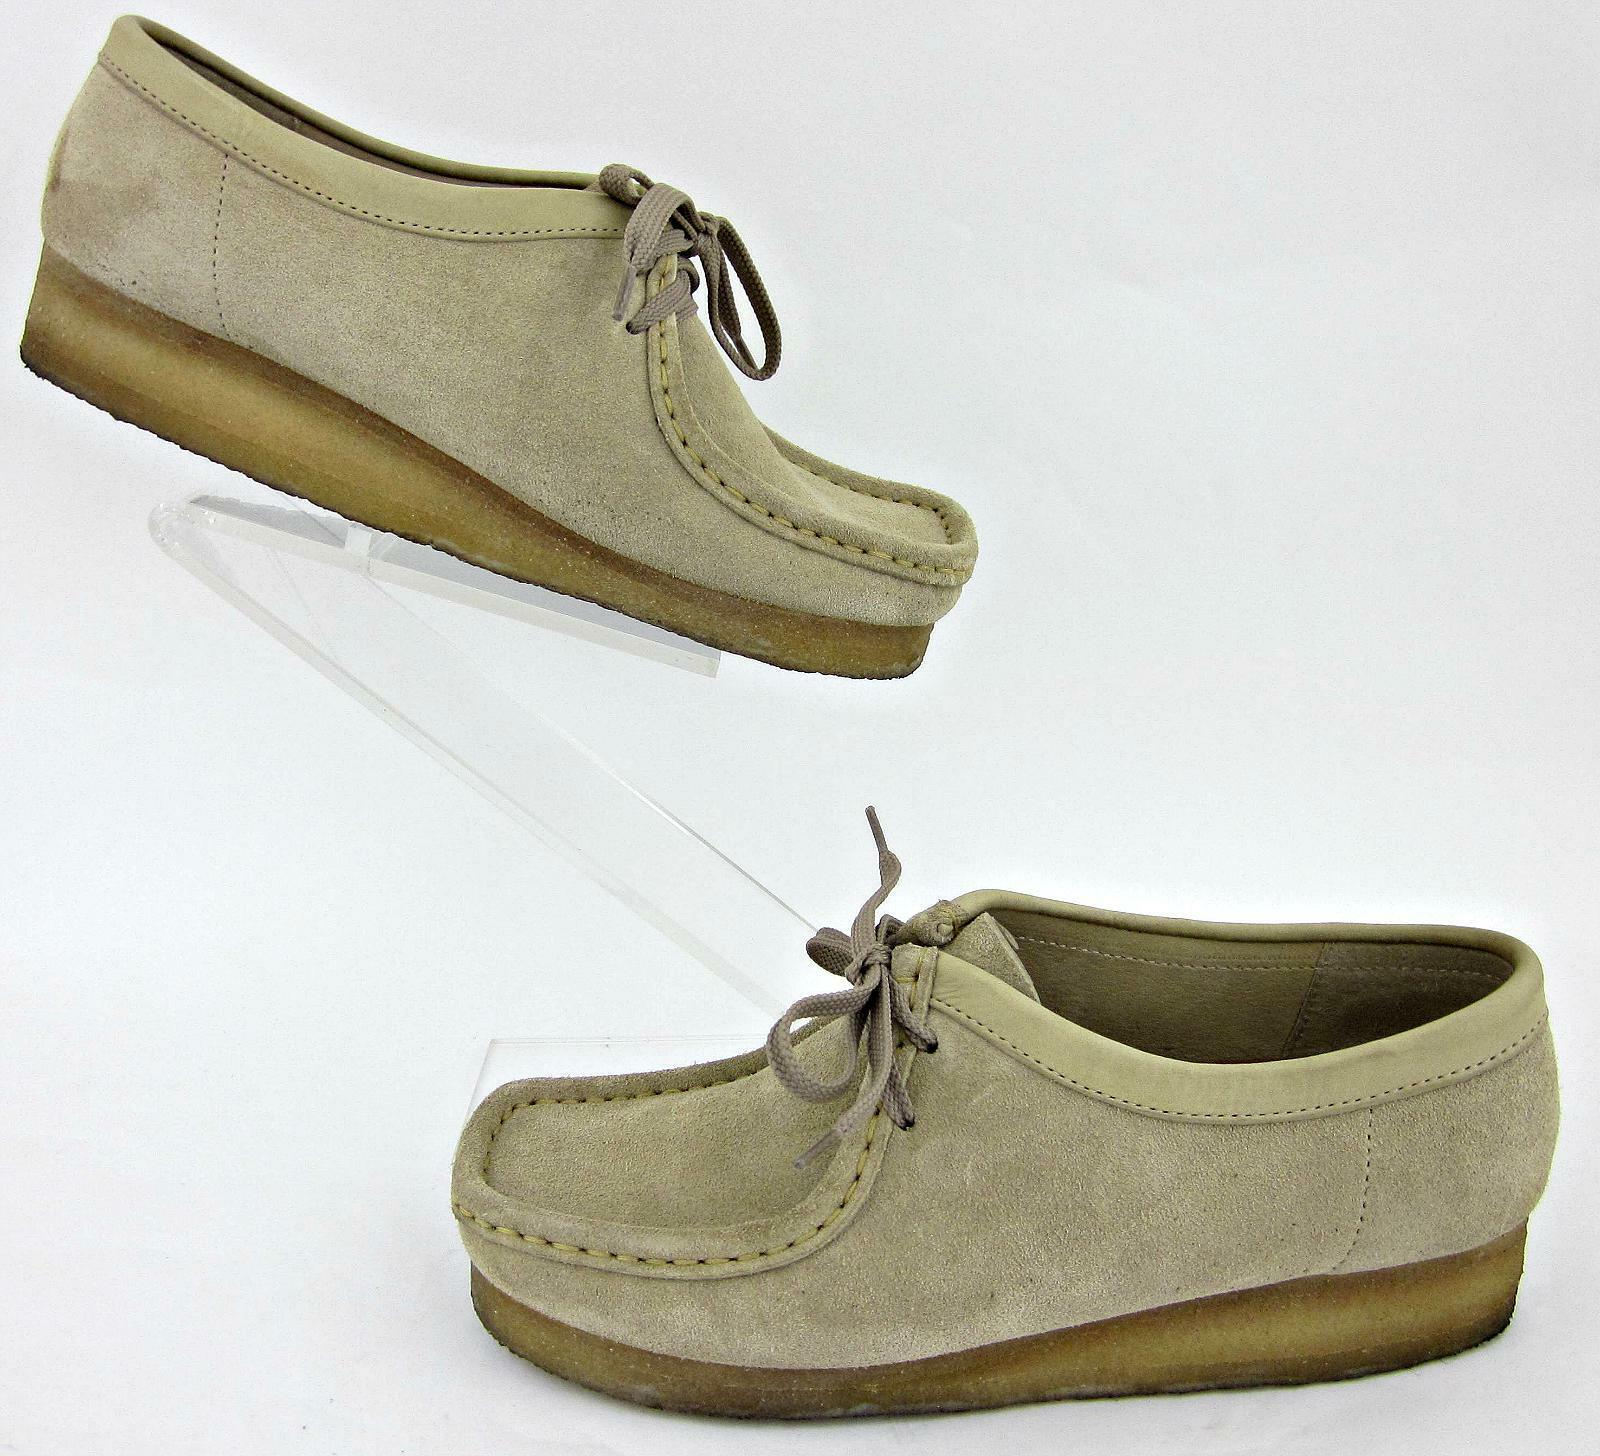 Clarks Originals Damenschuhe Wallabee Schuhes Sand Suede Leder Sz 9M